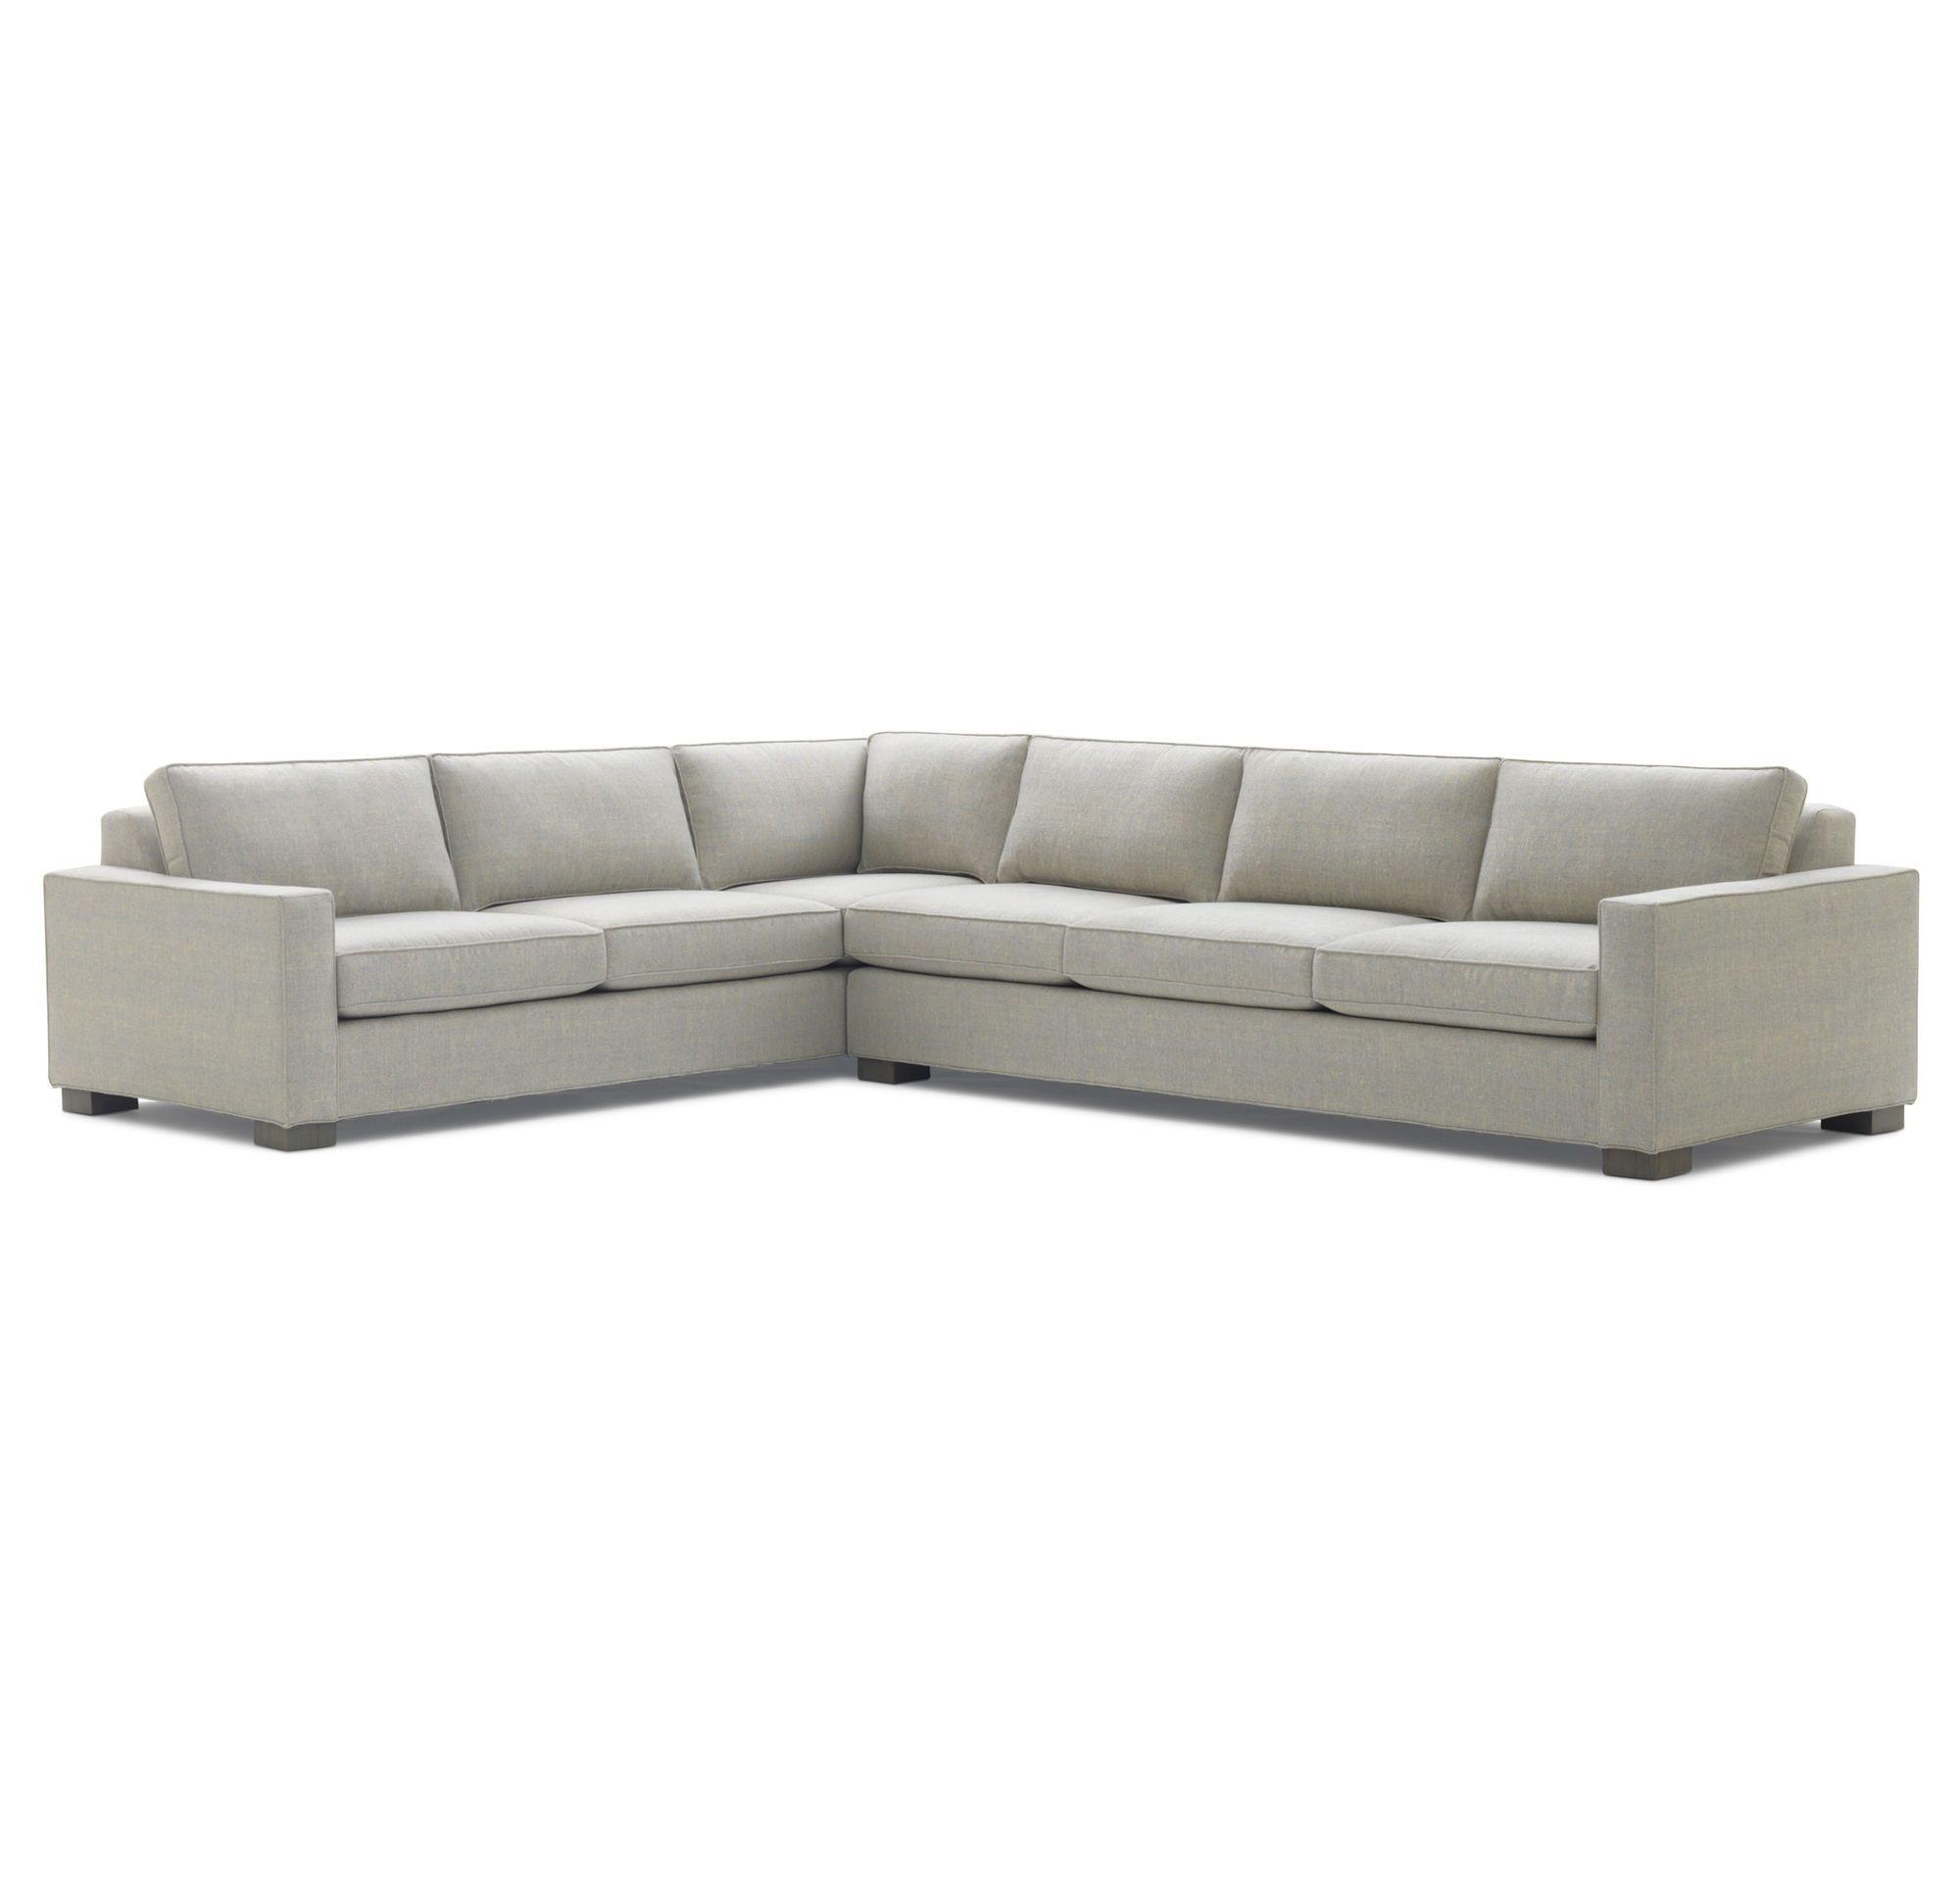 Carson 1280 052r 054l104345 62 Sectional Sofa Sectional Sofa